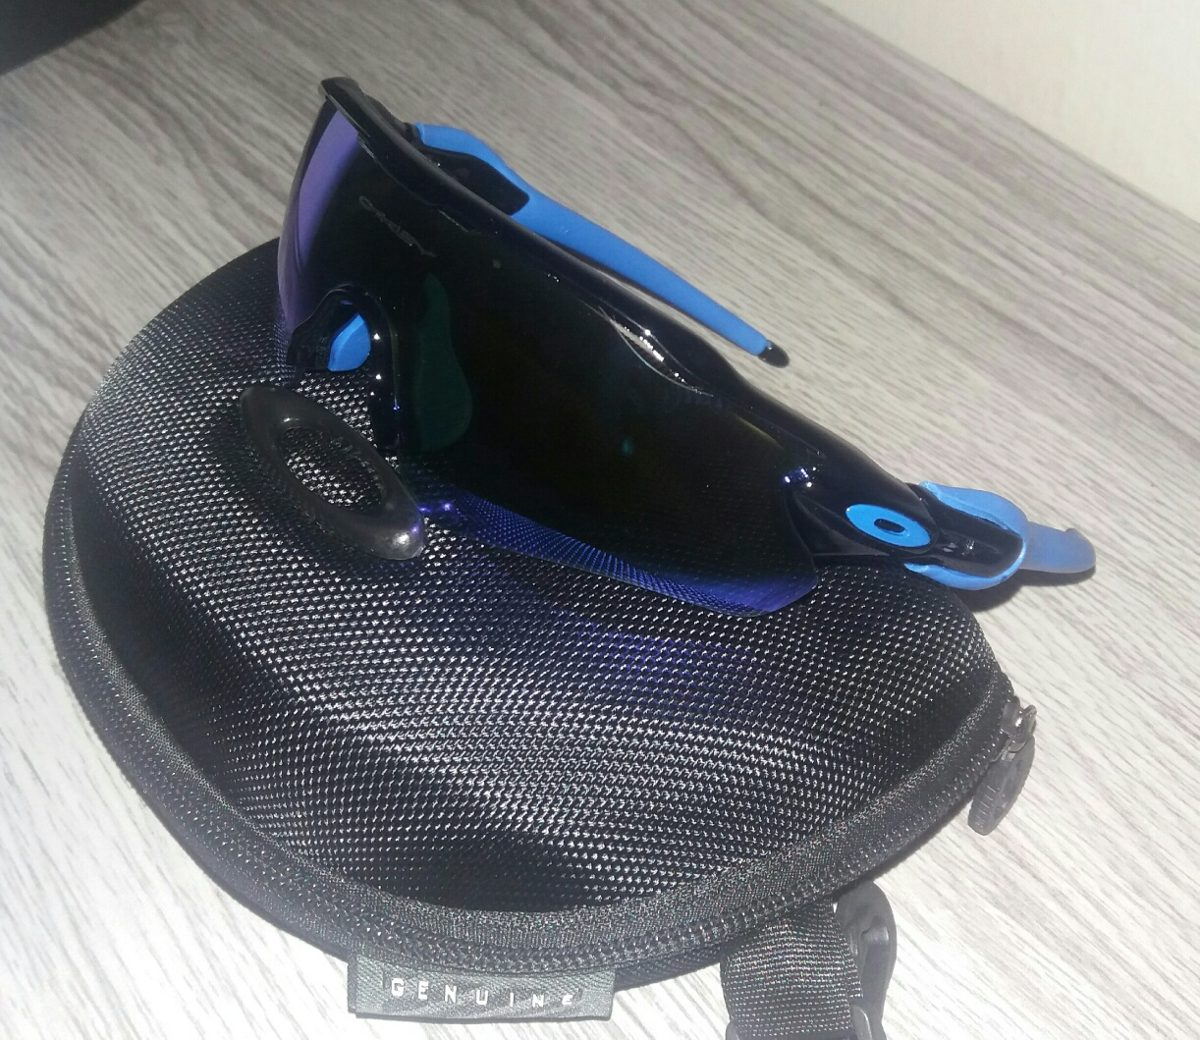 b8b1fe08762c3 Oculos Ciclismo Oakley Radar Ev Path 5 Lentes - R  190,00 em Mercado ...